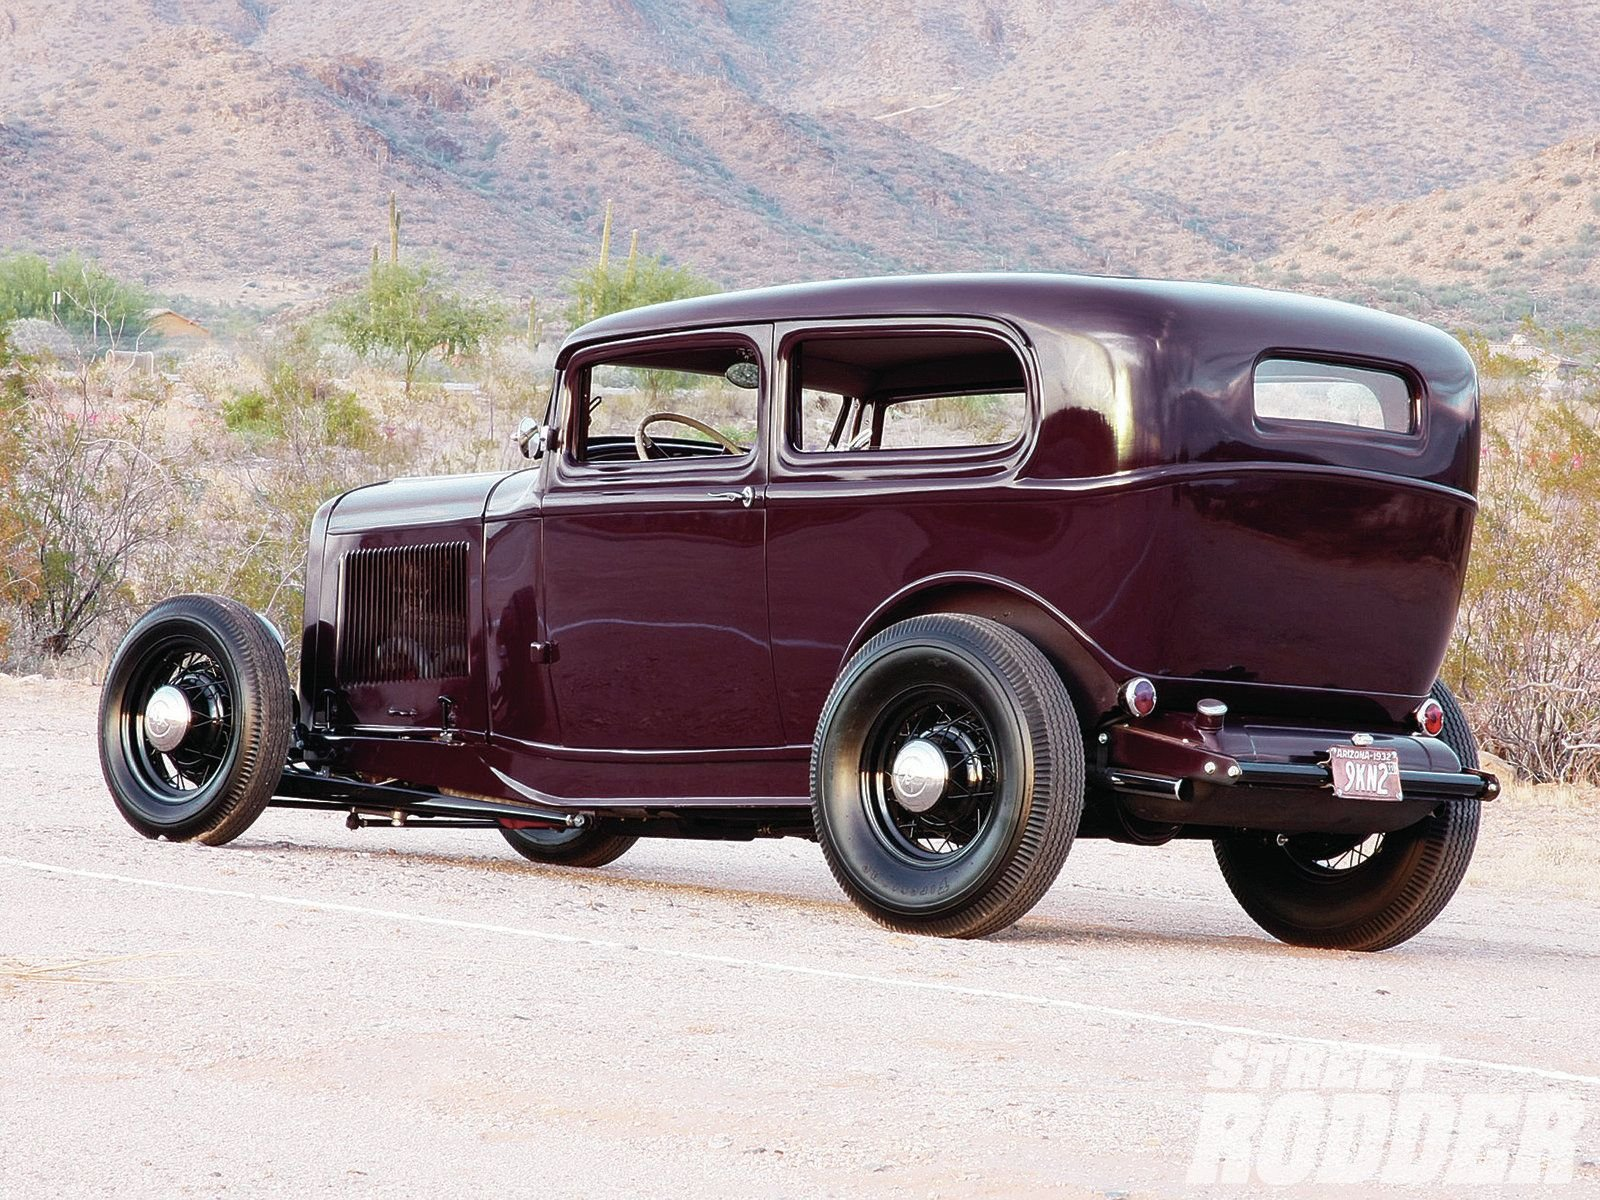 1932 Ford Tudor Sedan 2 Door Hotrod Hot Rod Old School USA 1600x1200 ...